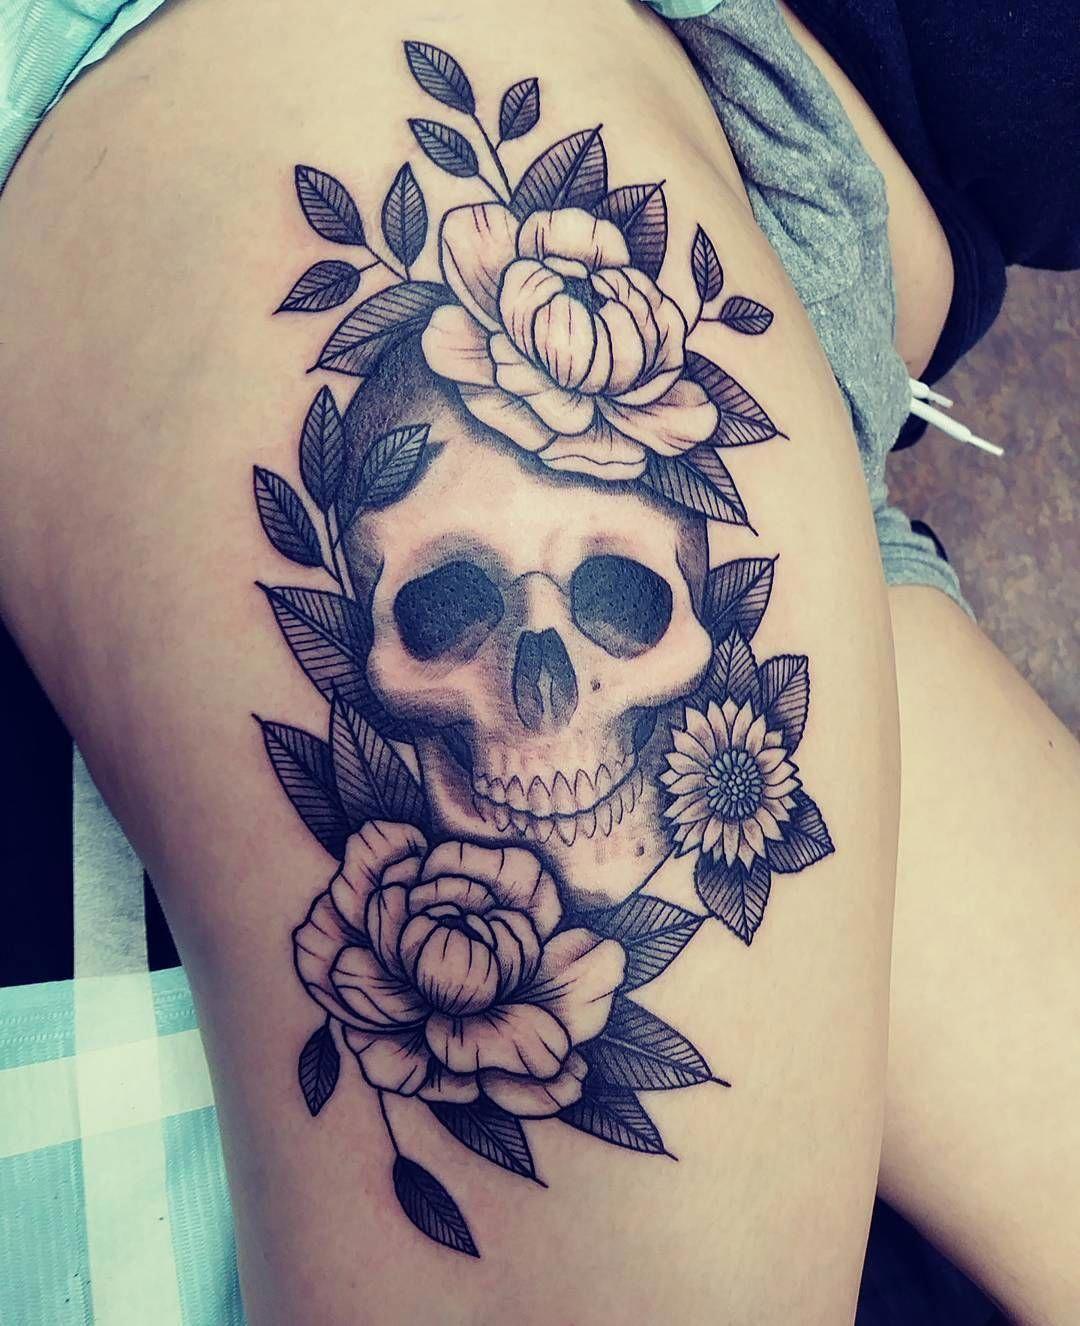 Awesome Skull With Sunflower Thigh Tattoo Design For Beautiful Women Tattoodesignsforwomen Skull Thigh Tattoos Thigh Tattoo Designs Thigh Tattoos Women